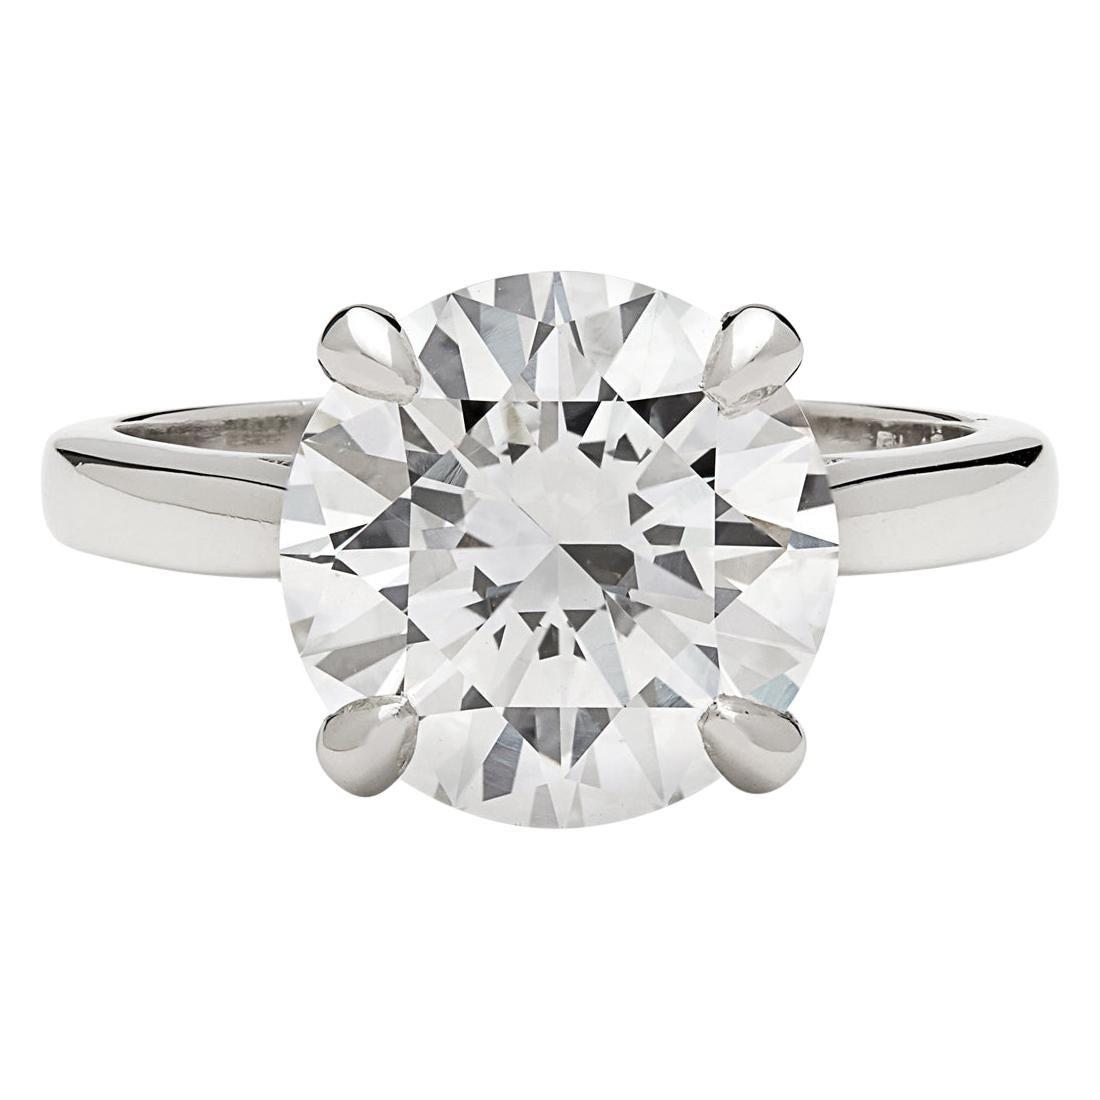 Impressive GIA 4.07 Carat Diamond Engagement Ring